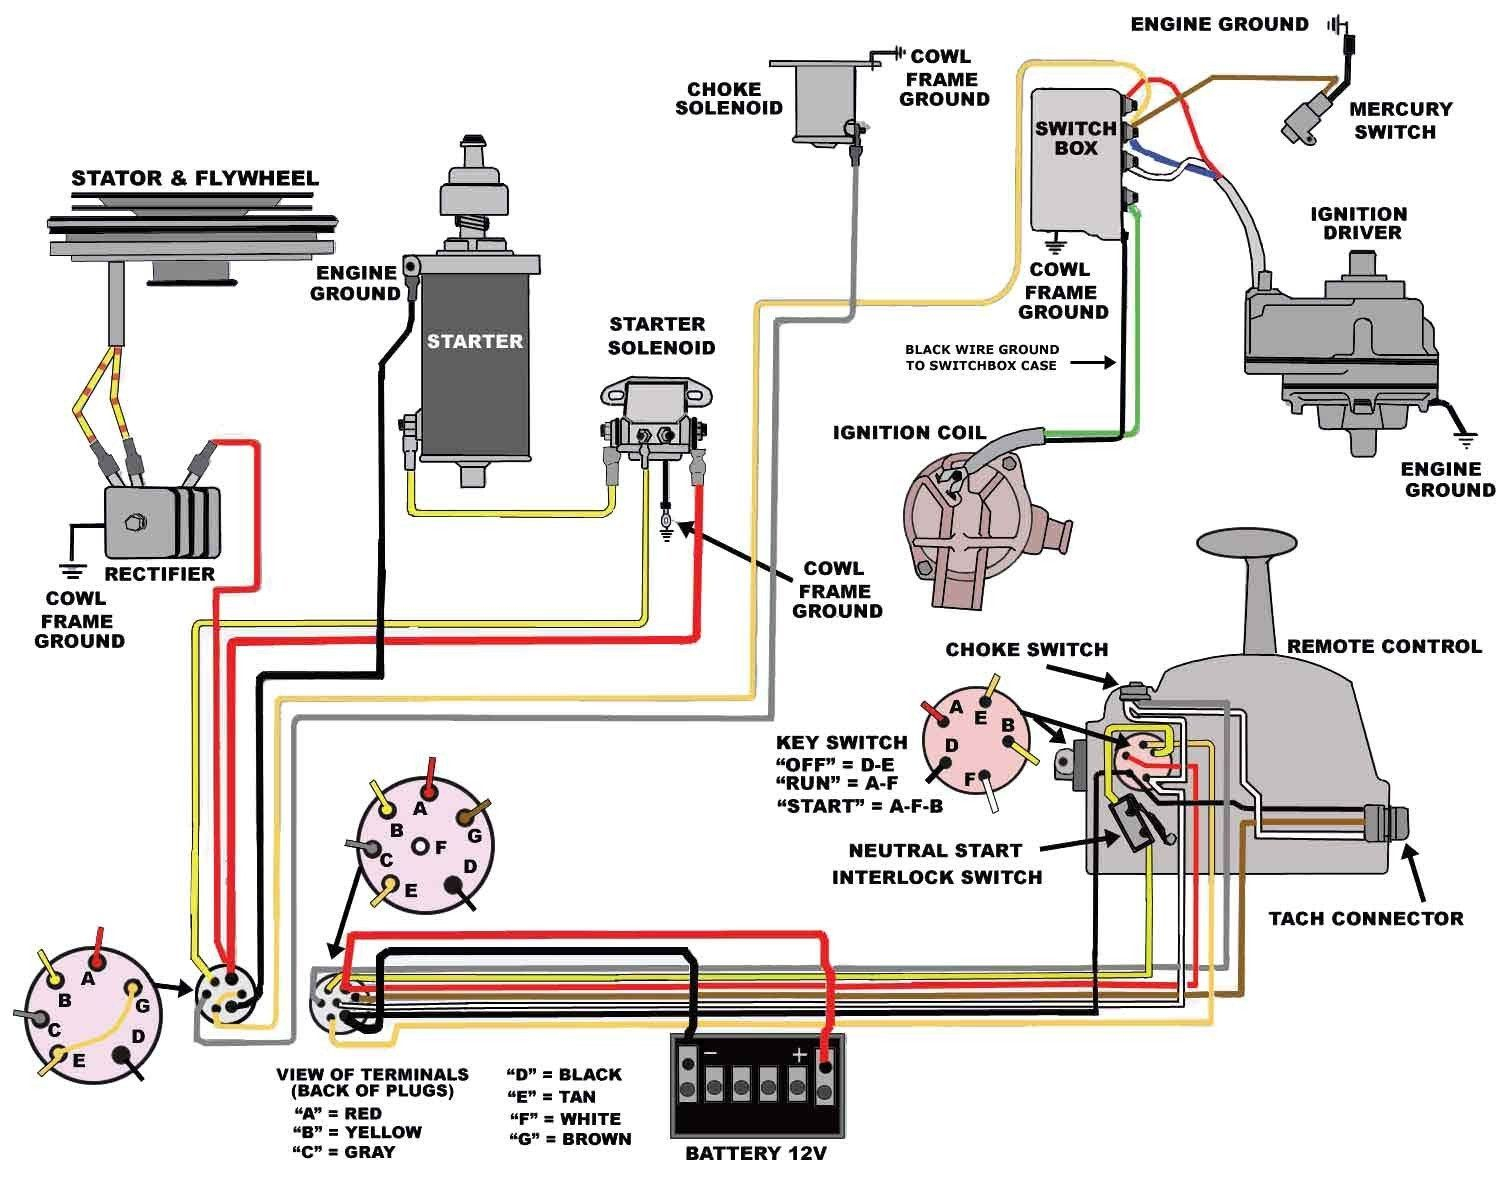 Wiring Diagram Further Mercruiser Thunderbolt Ignition Wiring ...